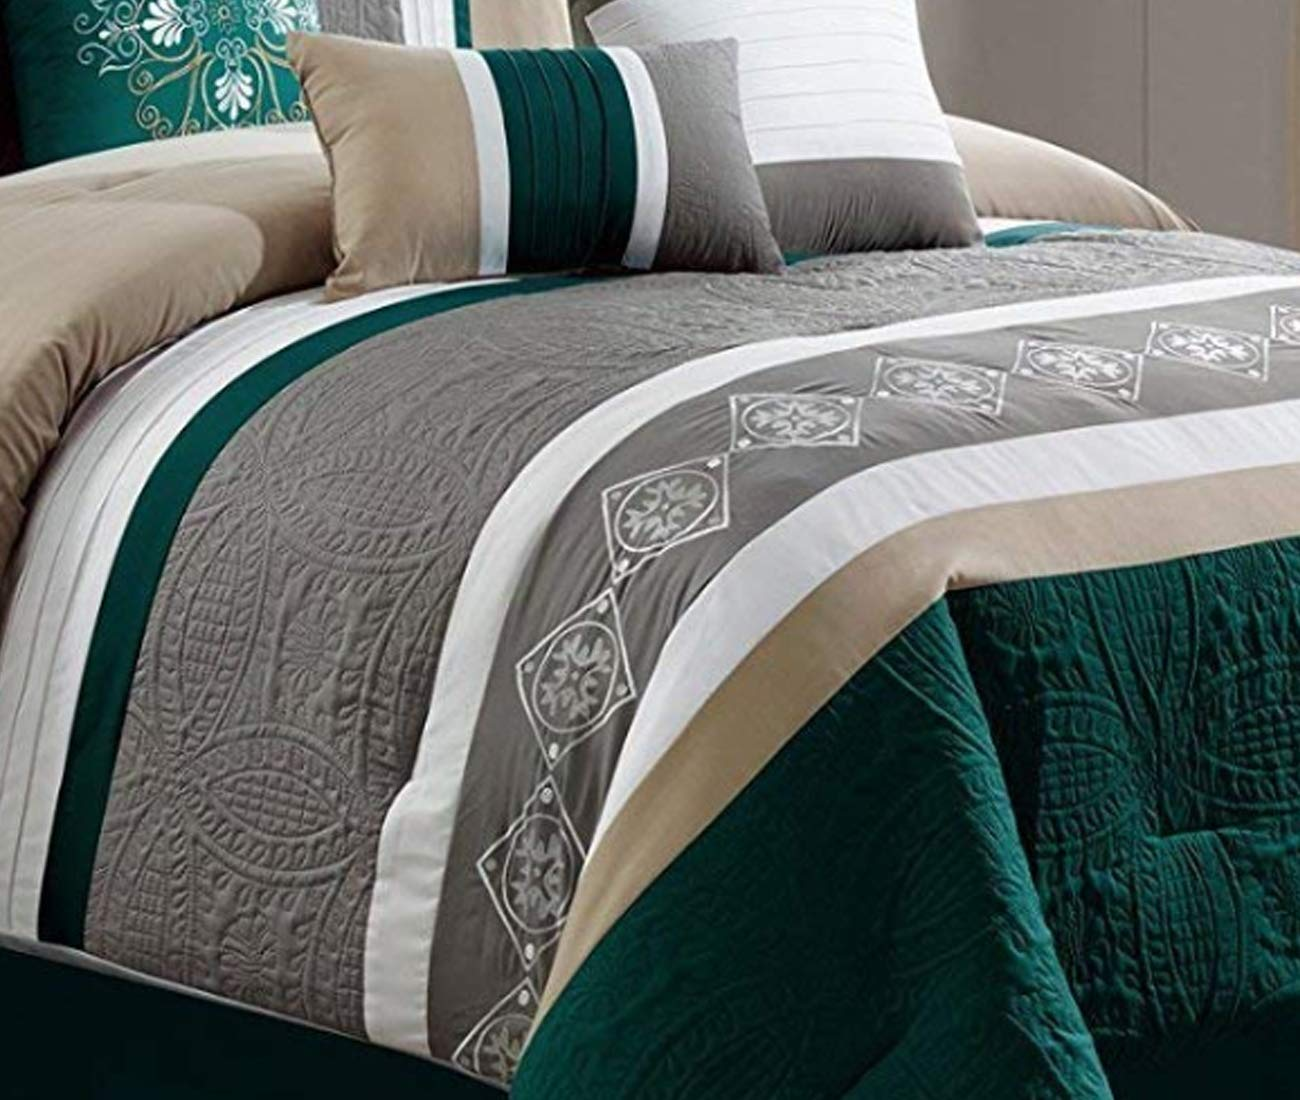 Pink, Queen JBFF 7 Piece Luxury Embroidery Bed in Bag Microfiber Comforter Set